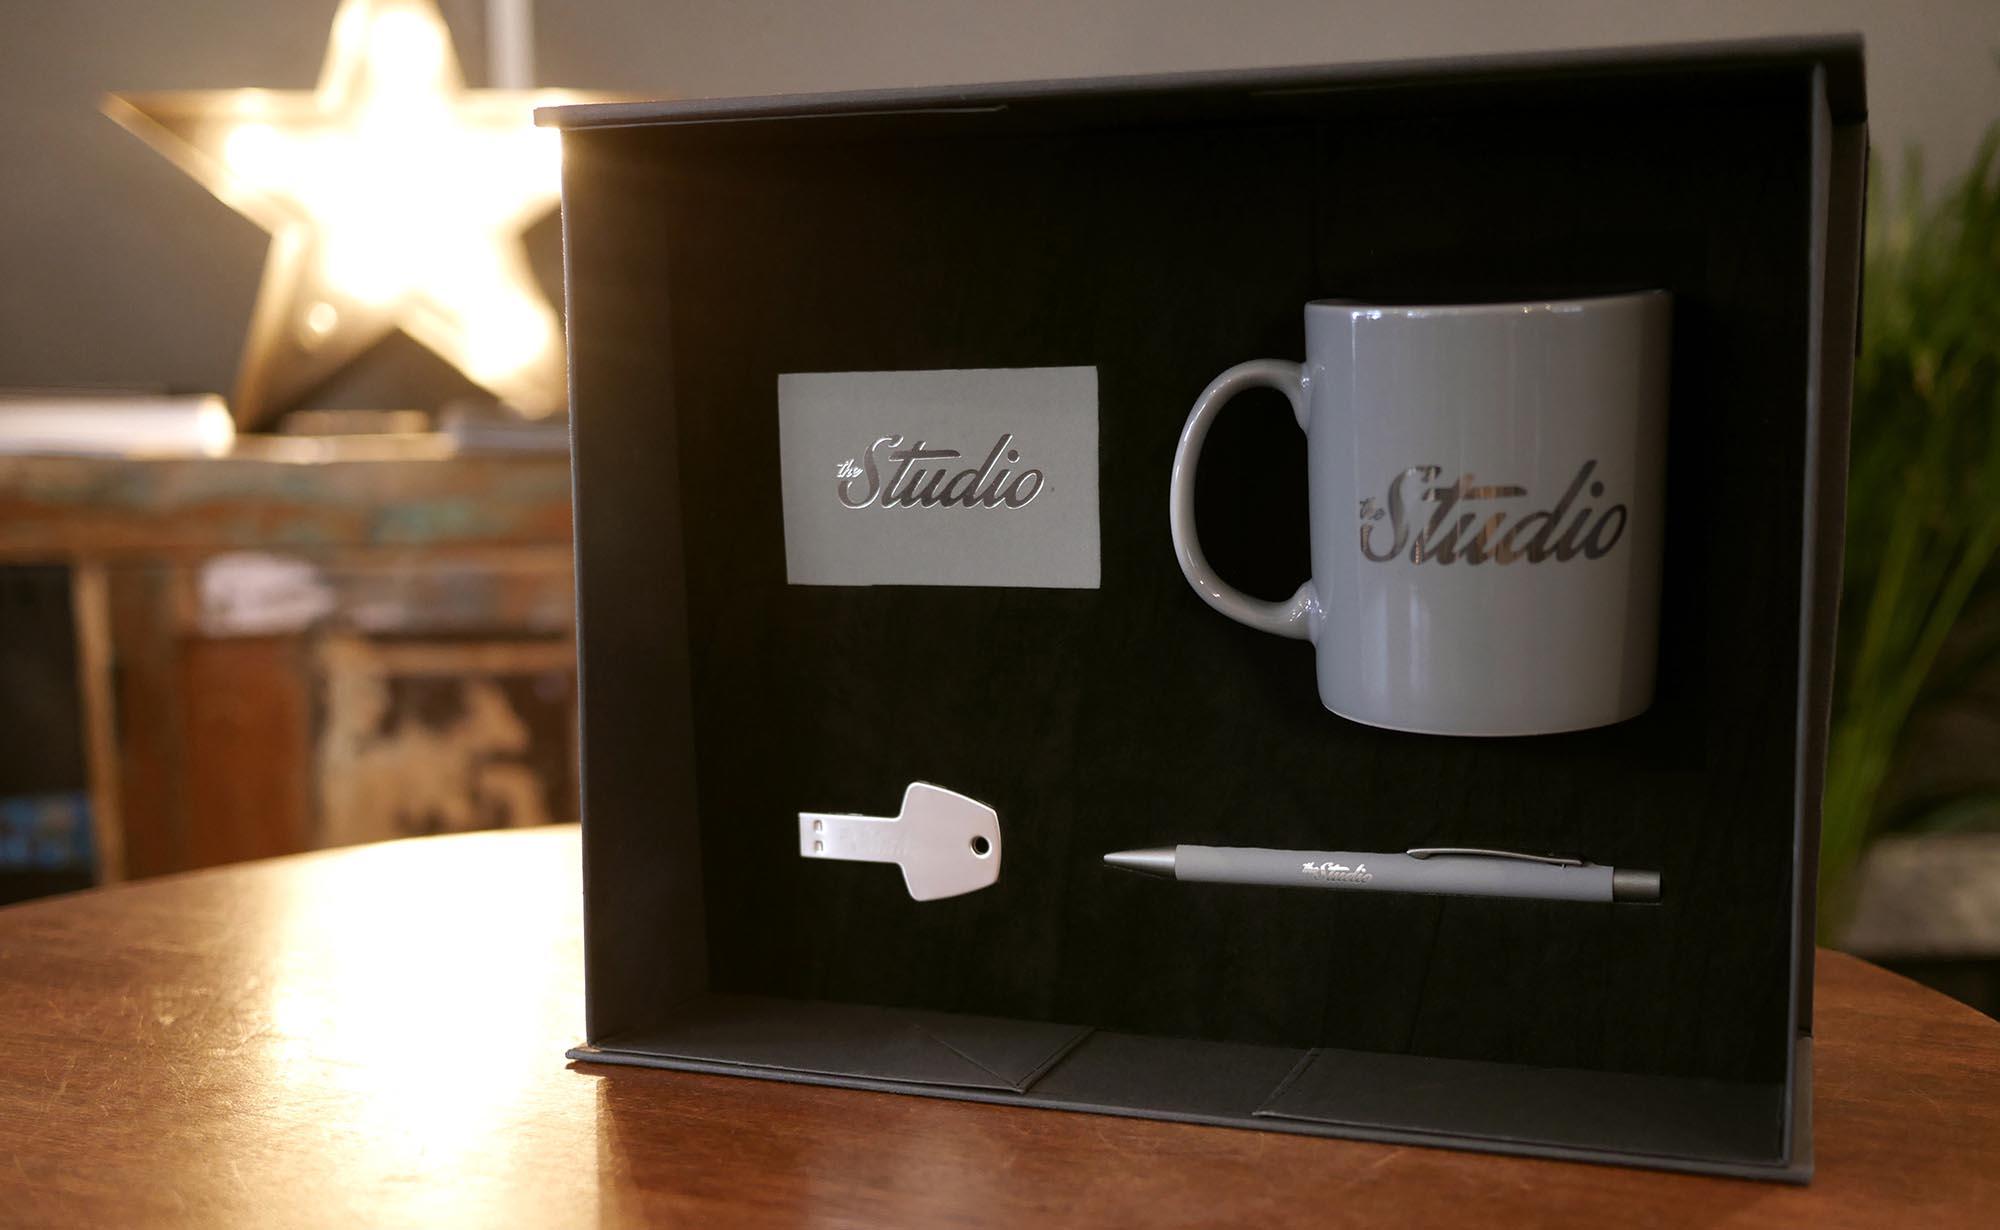 The Studio Luxury Branding Box